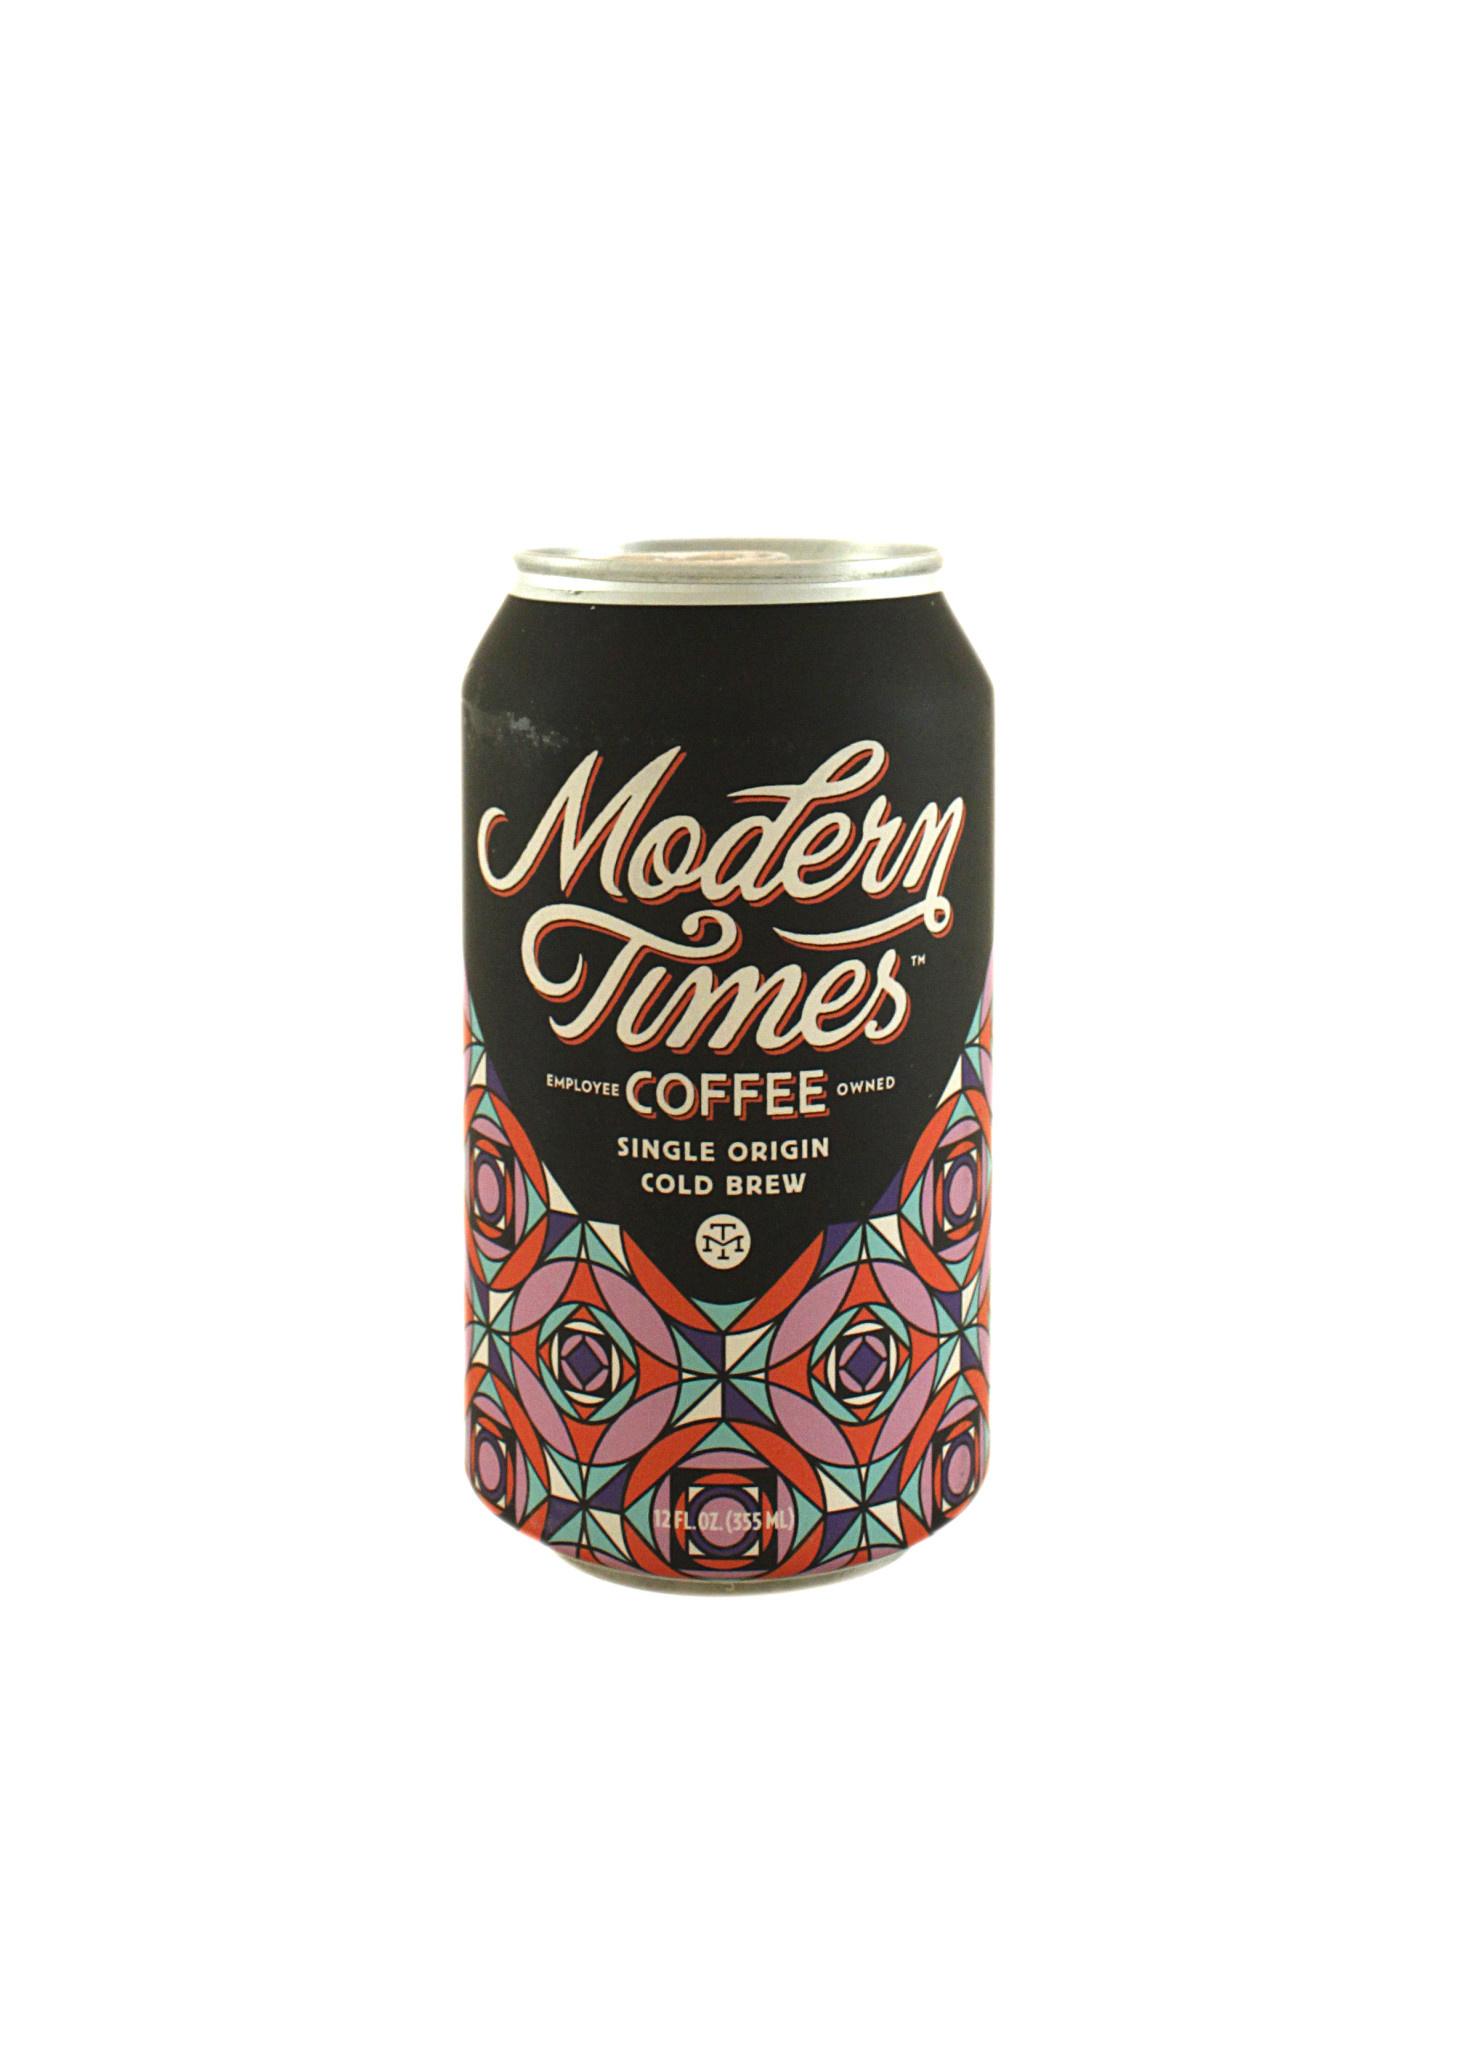 Modern Times Coffee Single Origin Cold Brew 100% Mexico 12oz. Can